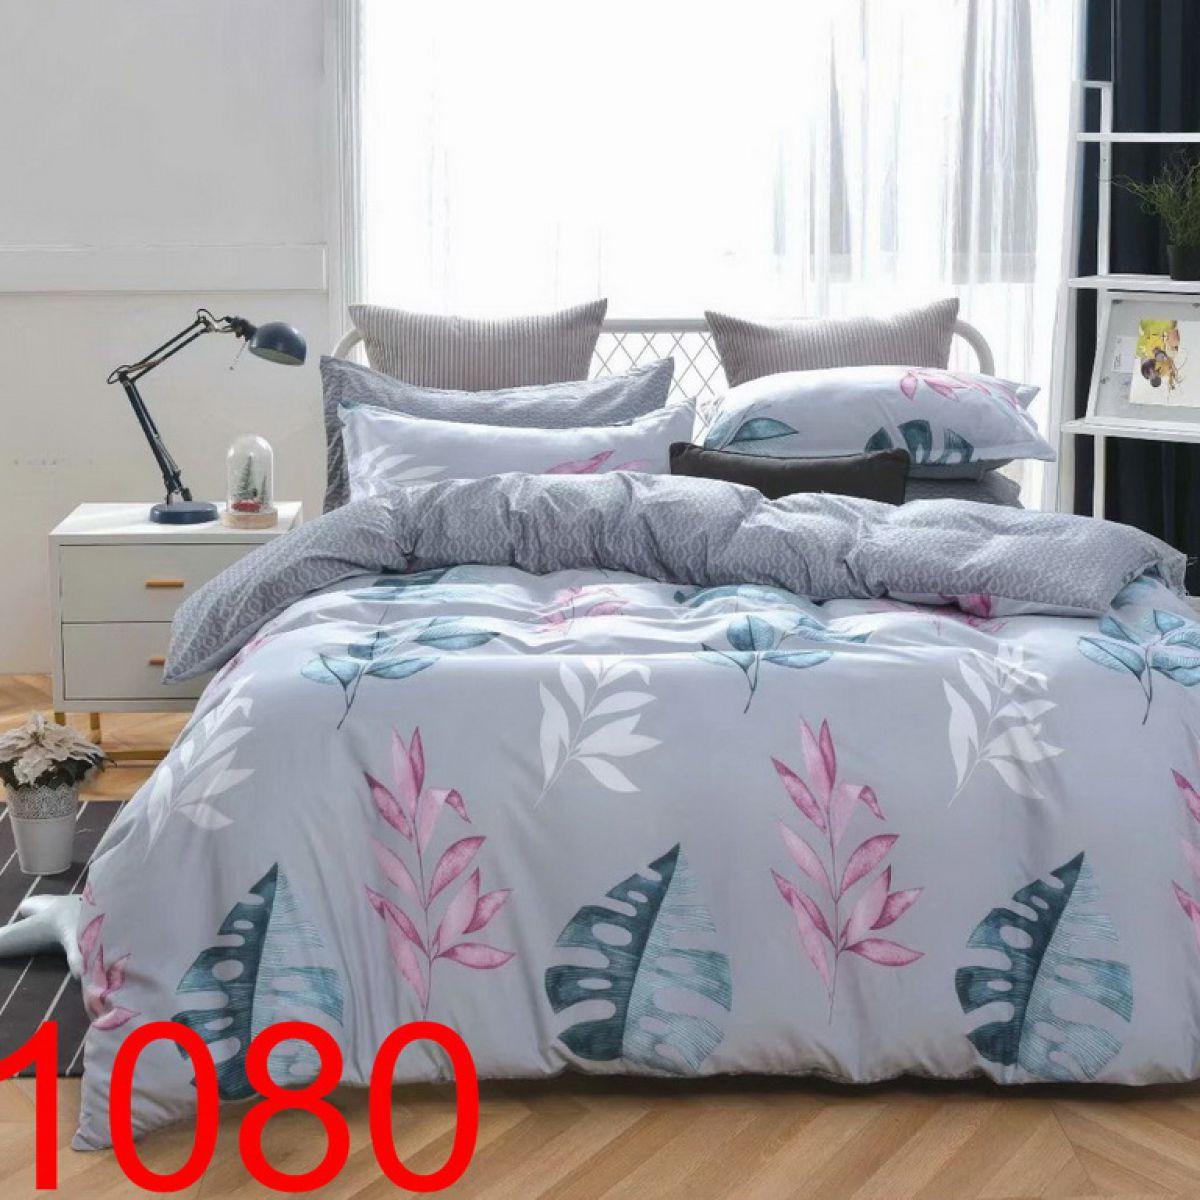 Double-sided Beddings - FBC-8053 - 140x200 cm - 2 pcs